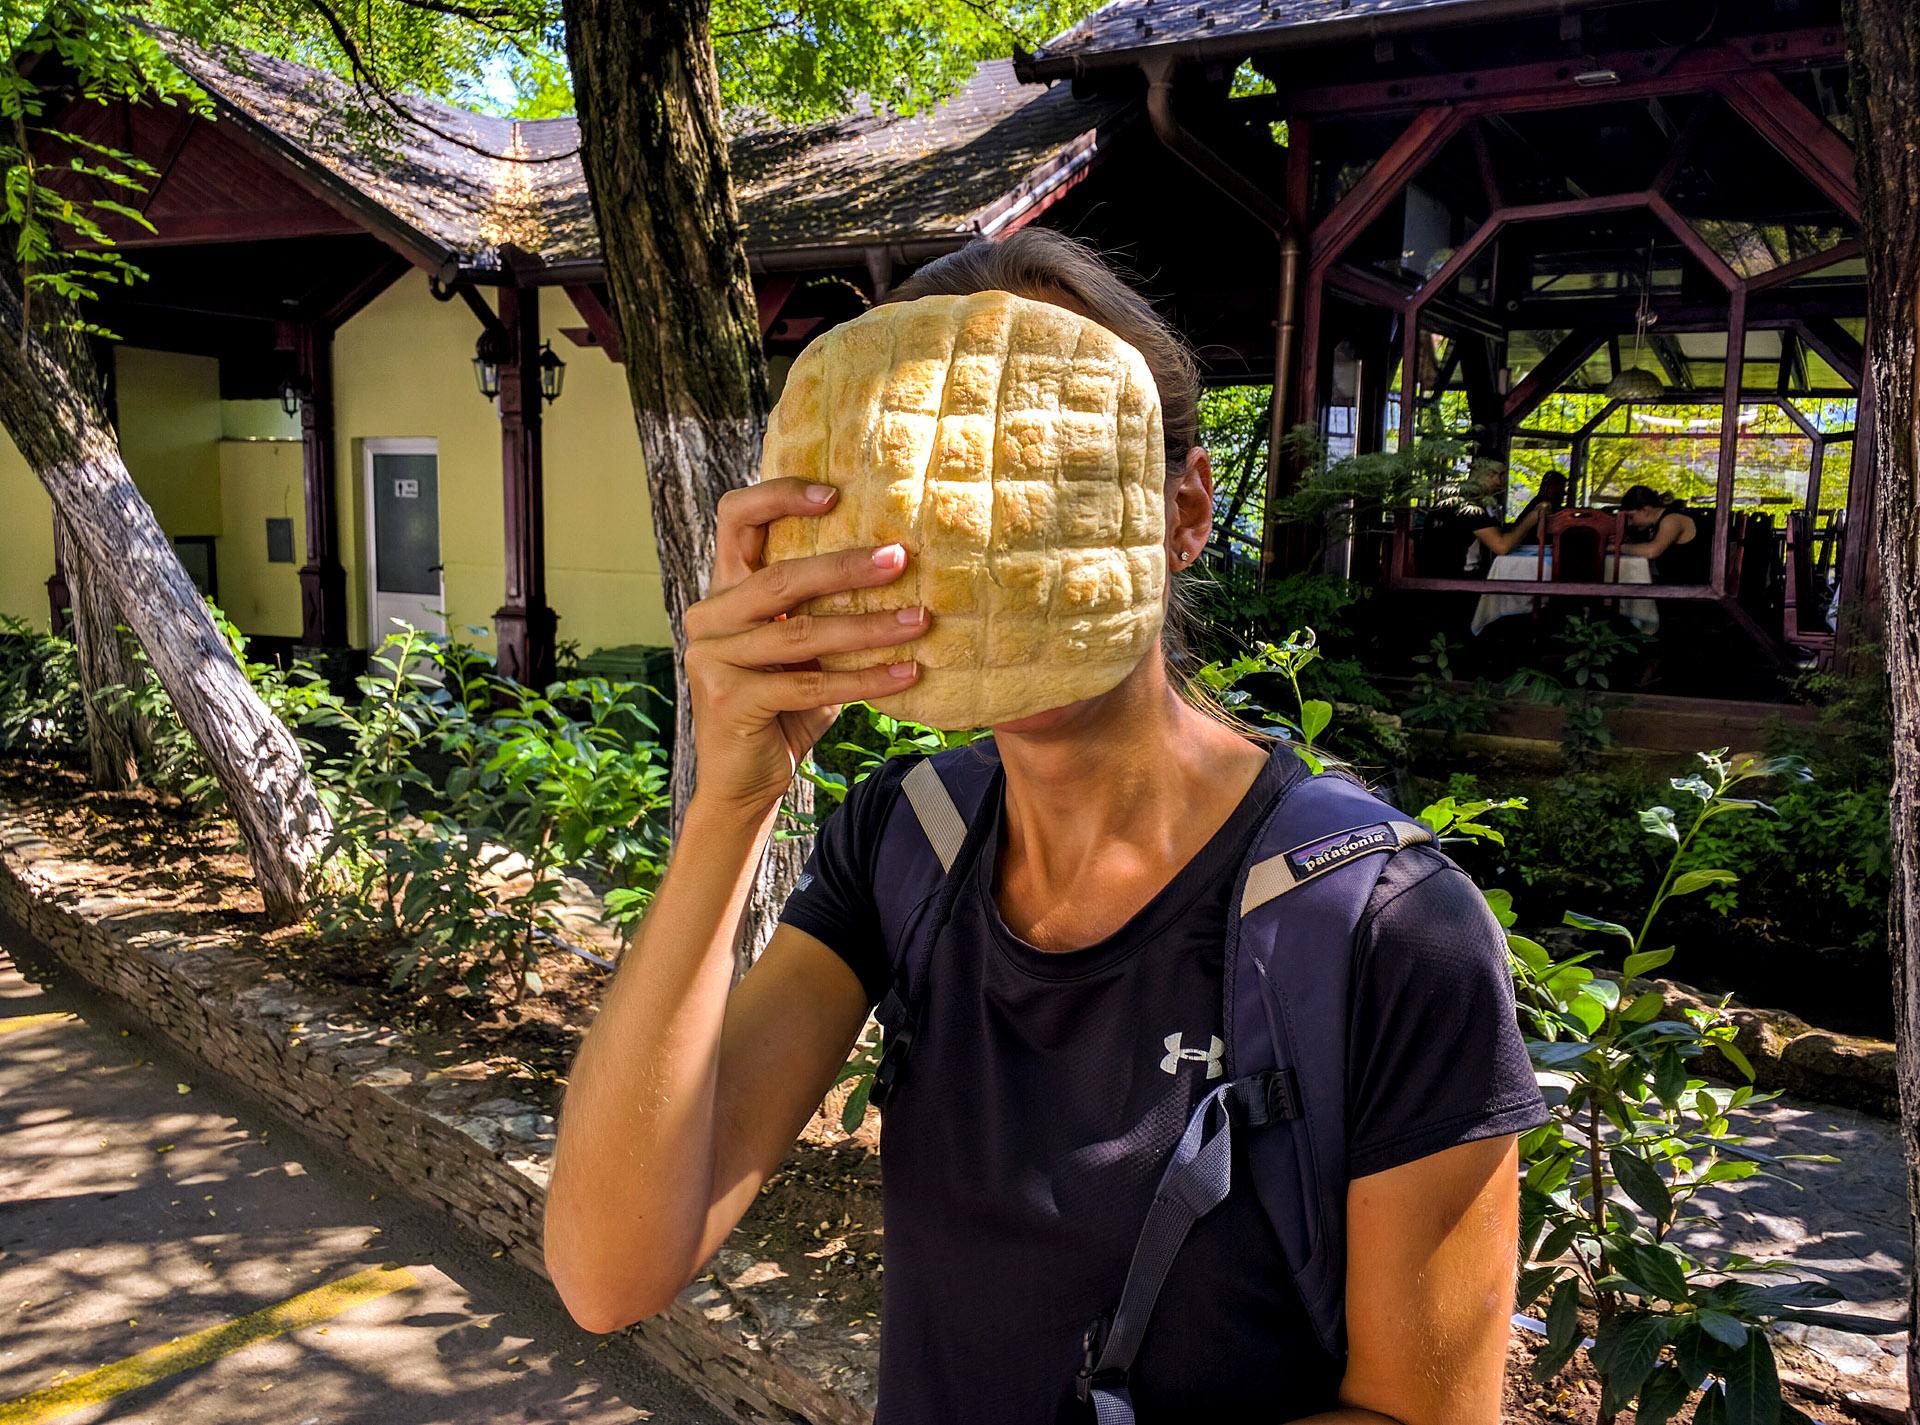 Holy bread! (Jablanica, Bosnia & Herzegovina)